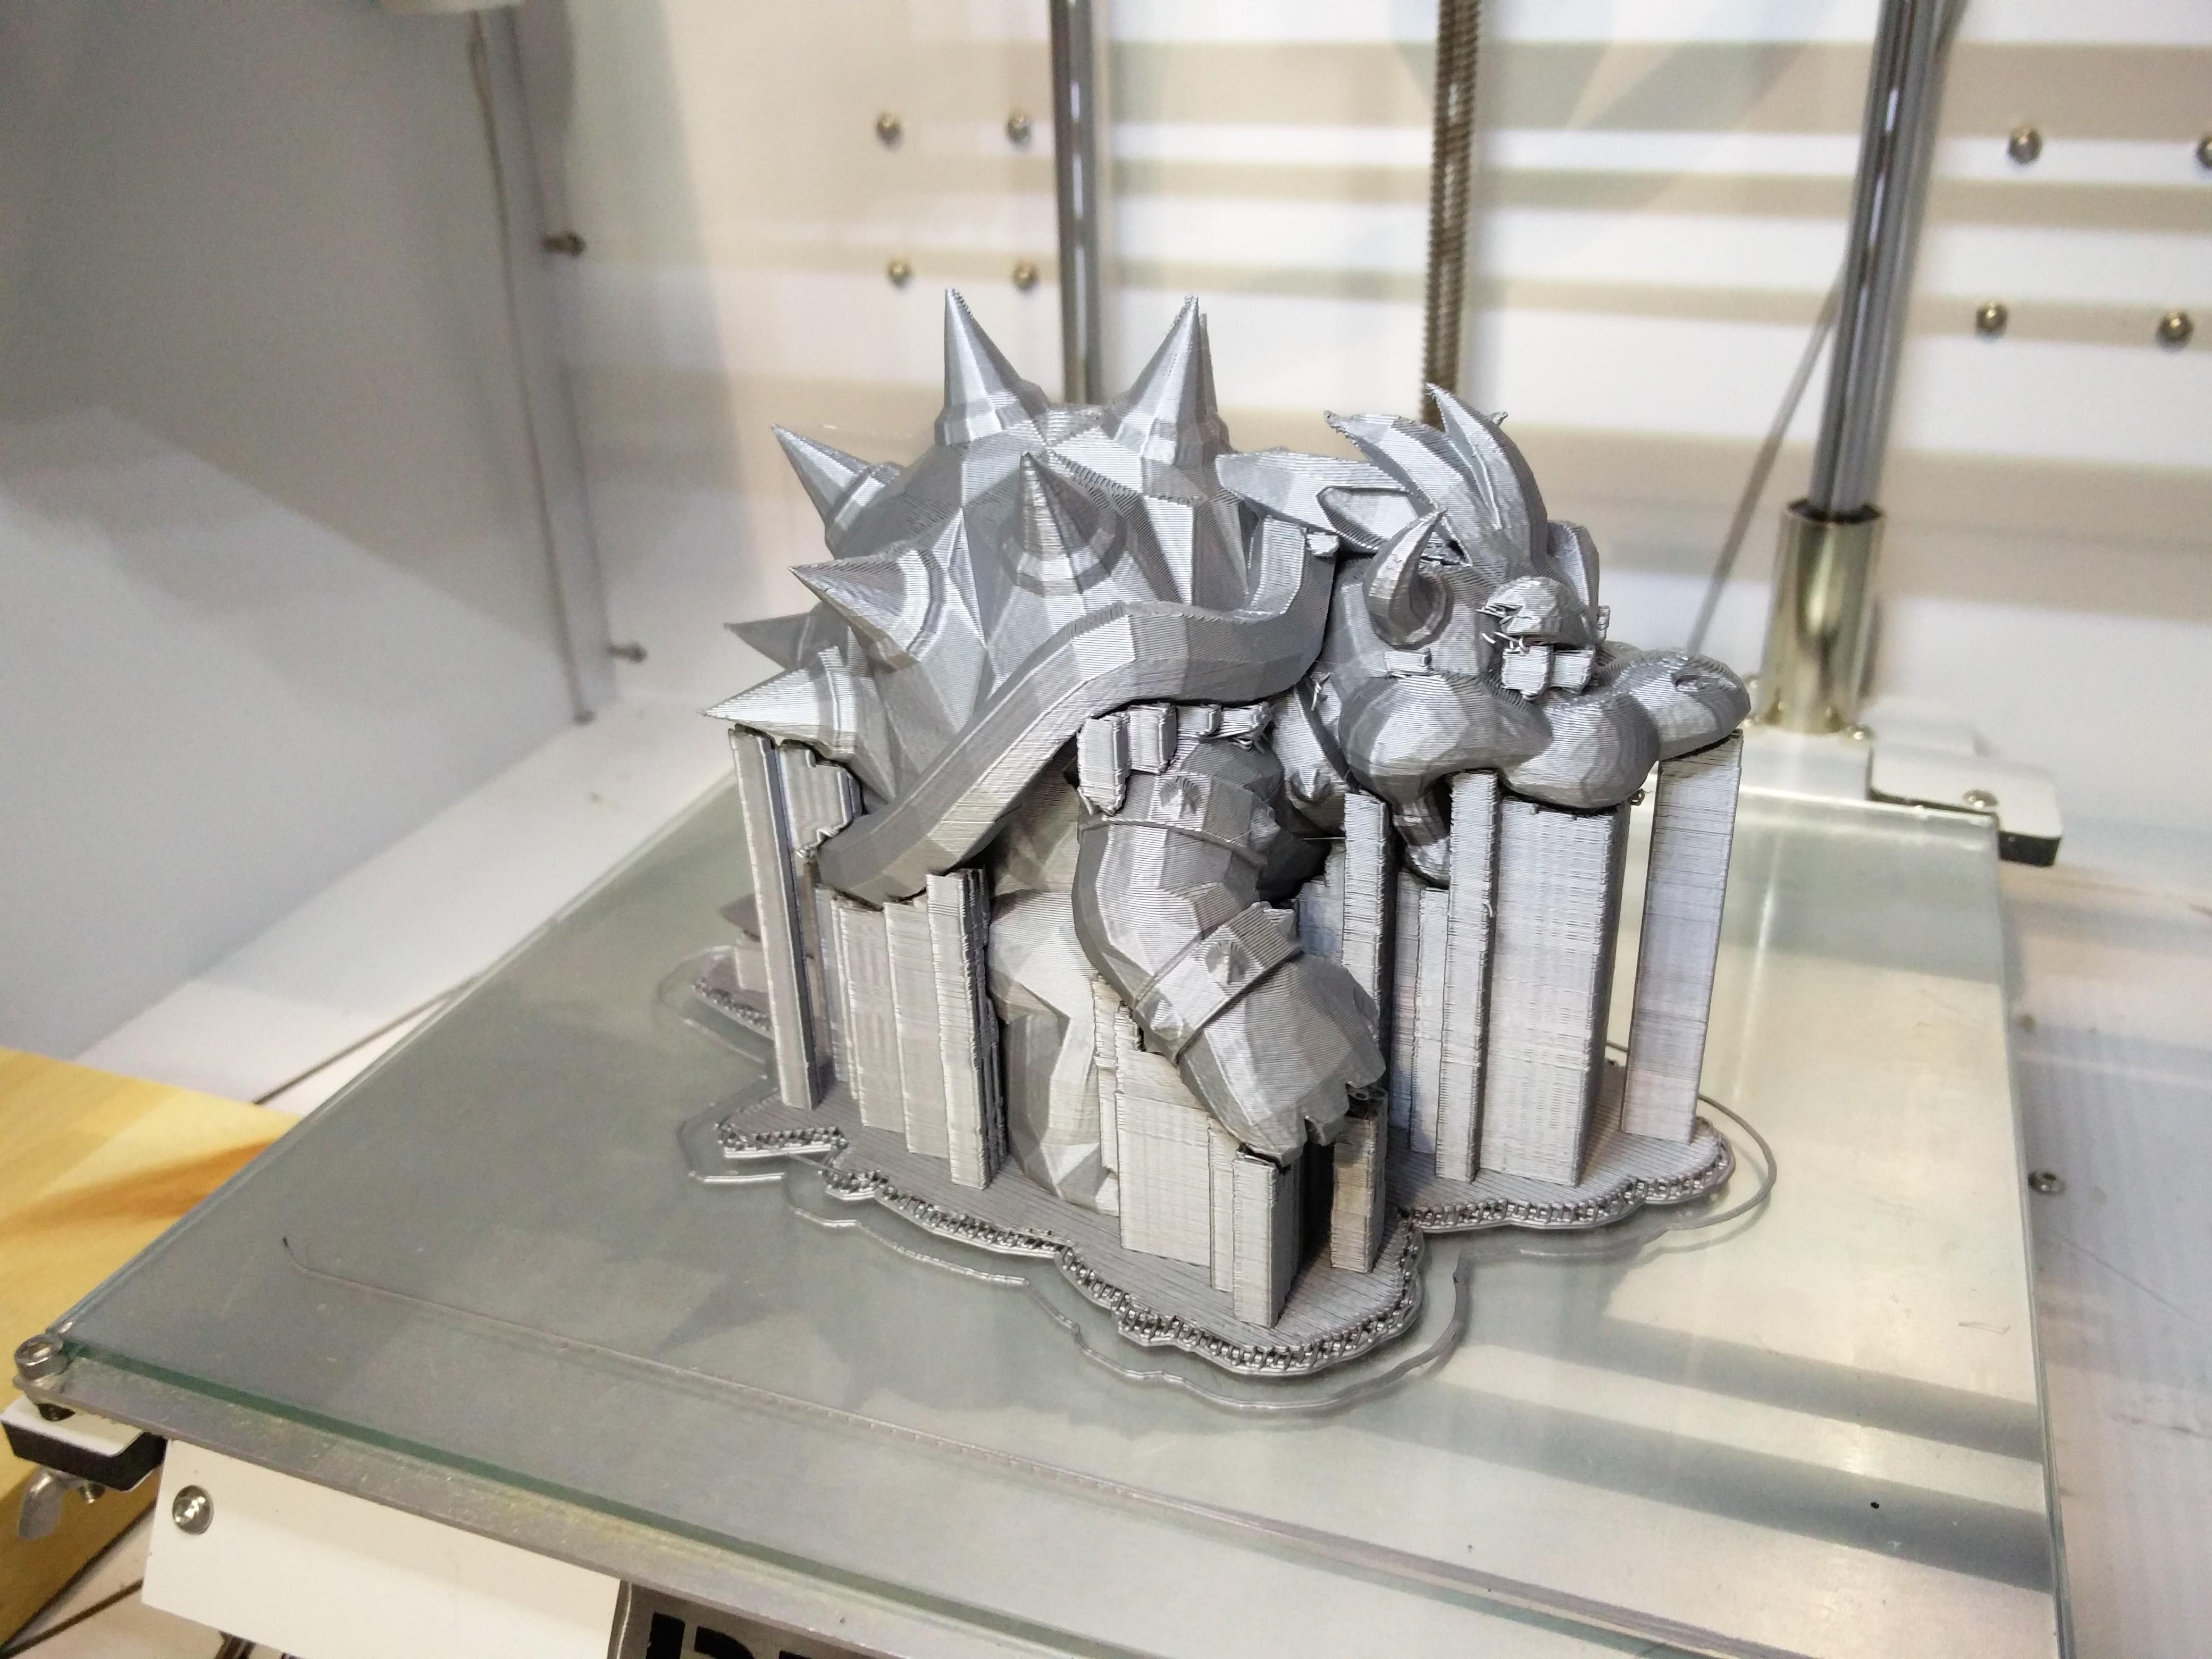 Did anyone use BIBO 3D printer yet? - 3D Printing / 3D Printers